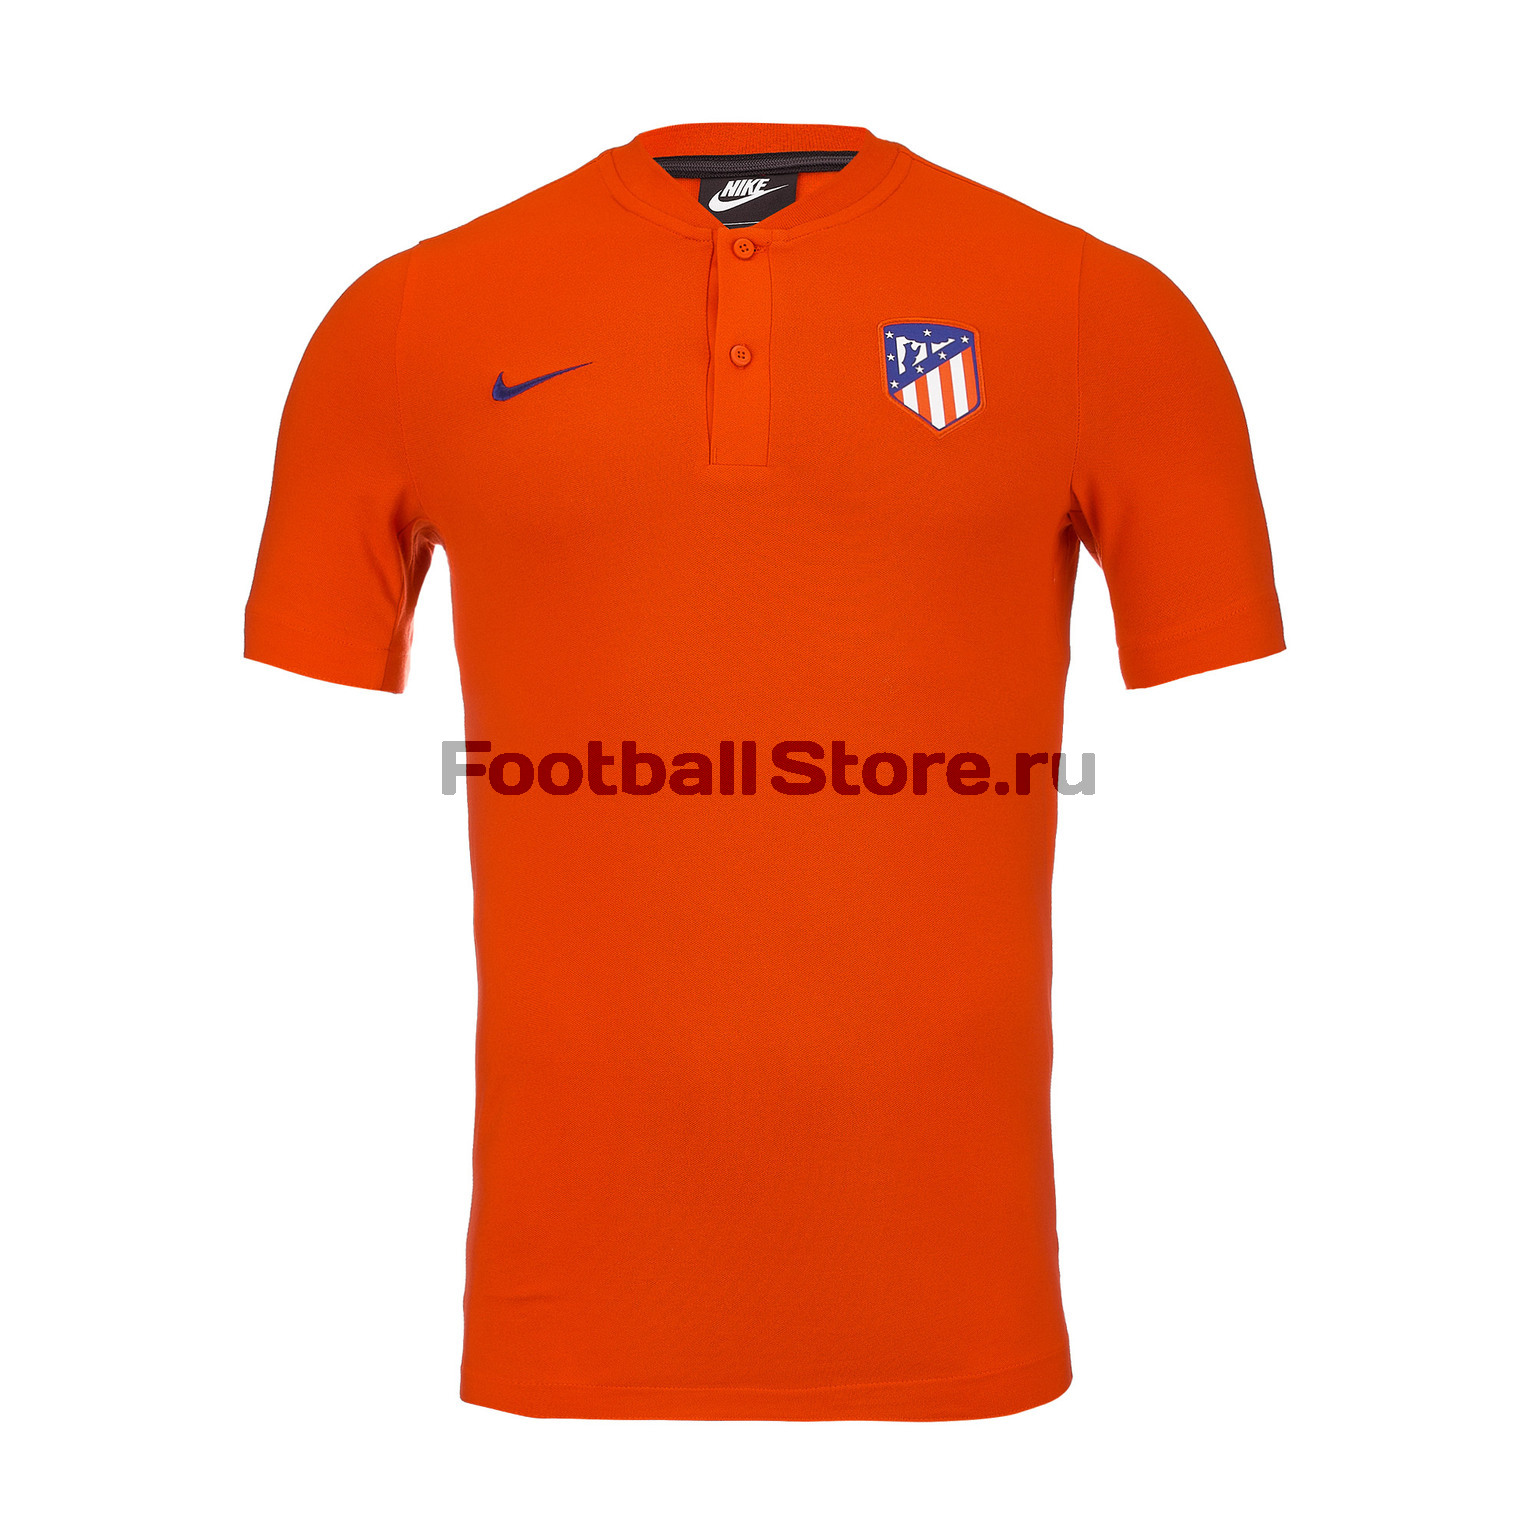 все цены на Поло Nike Atletico Madrid AV5254-600 онлайн